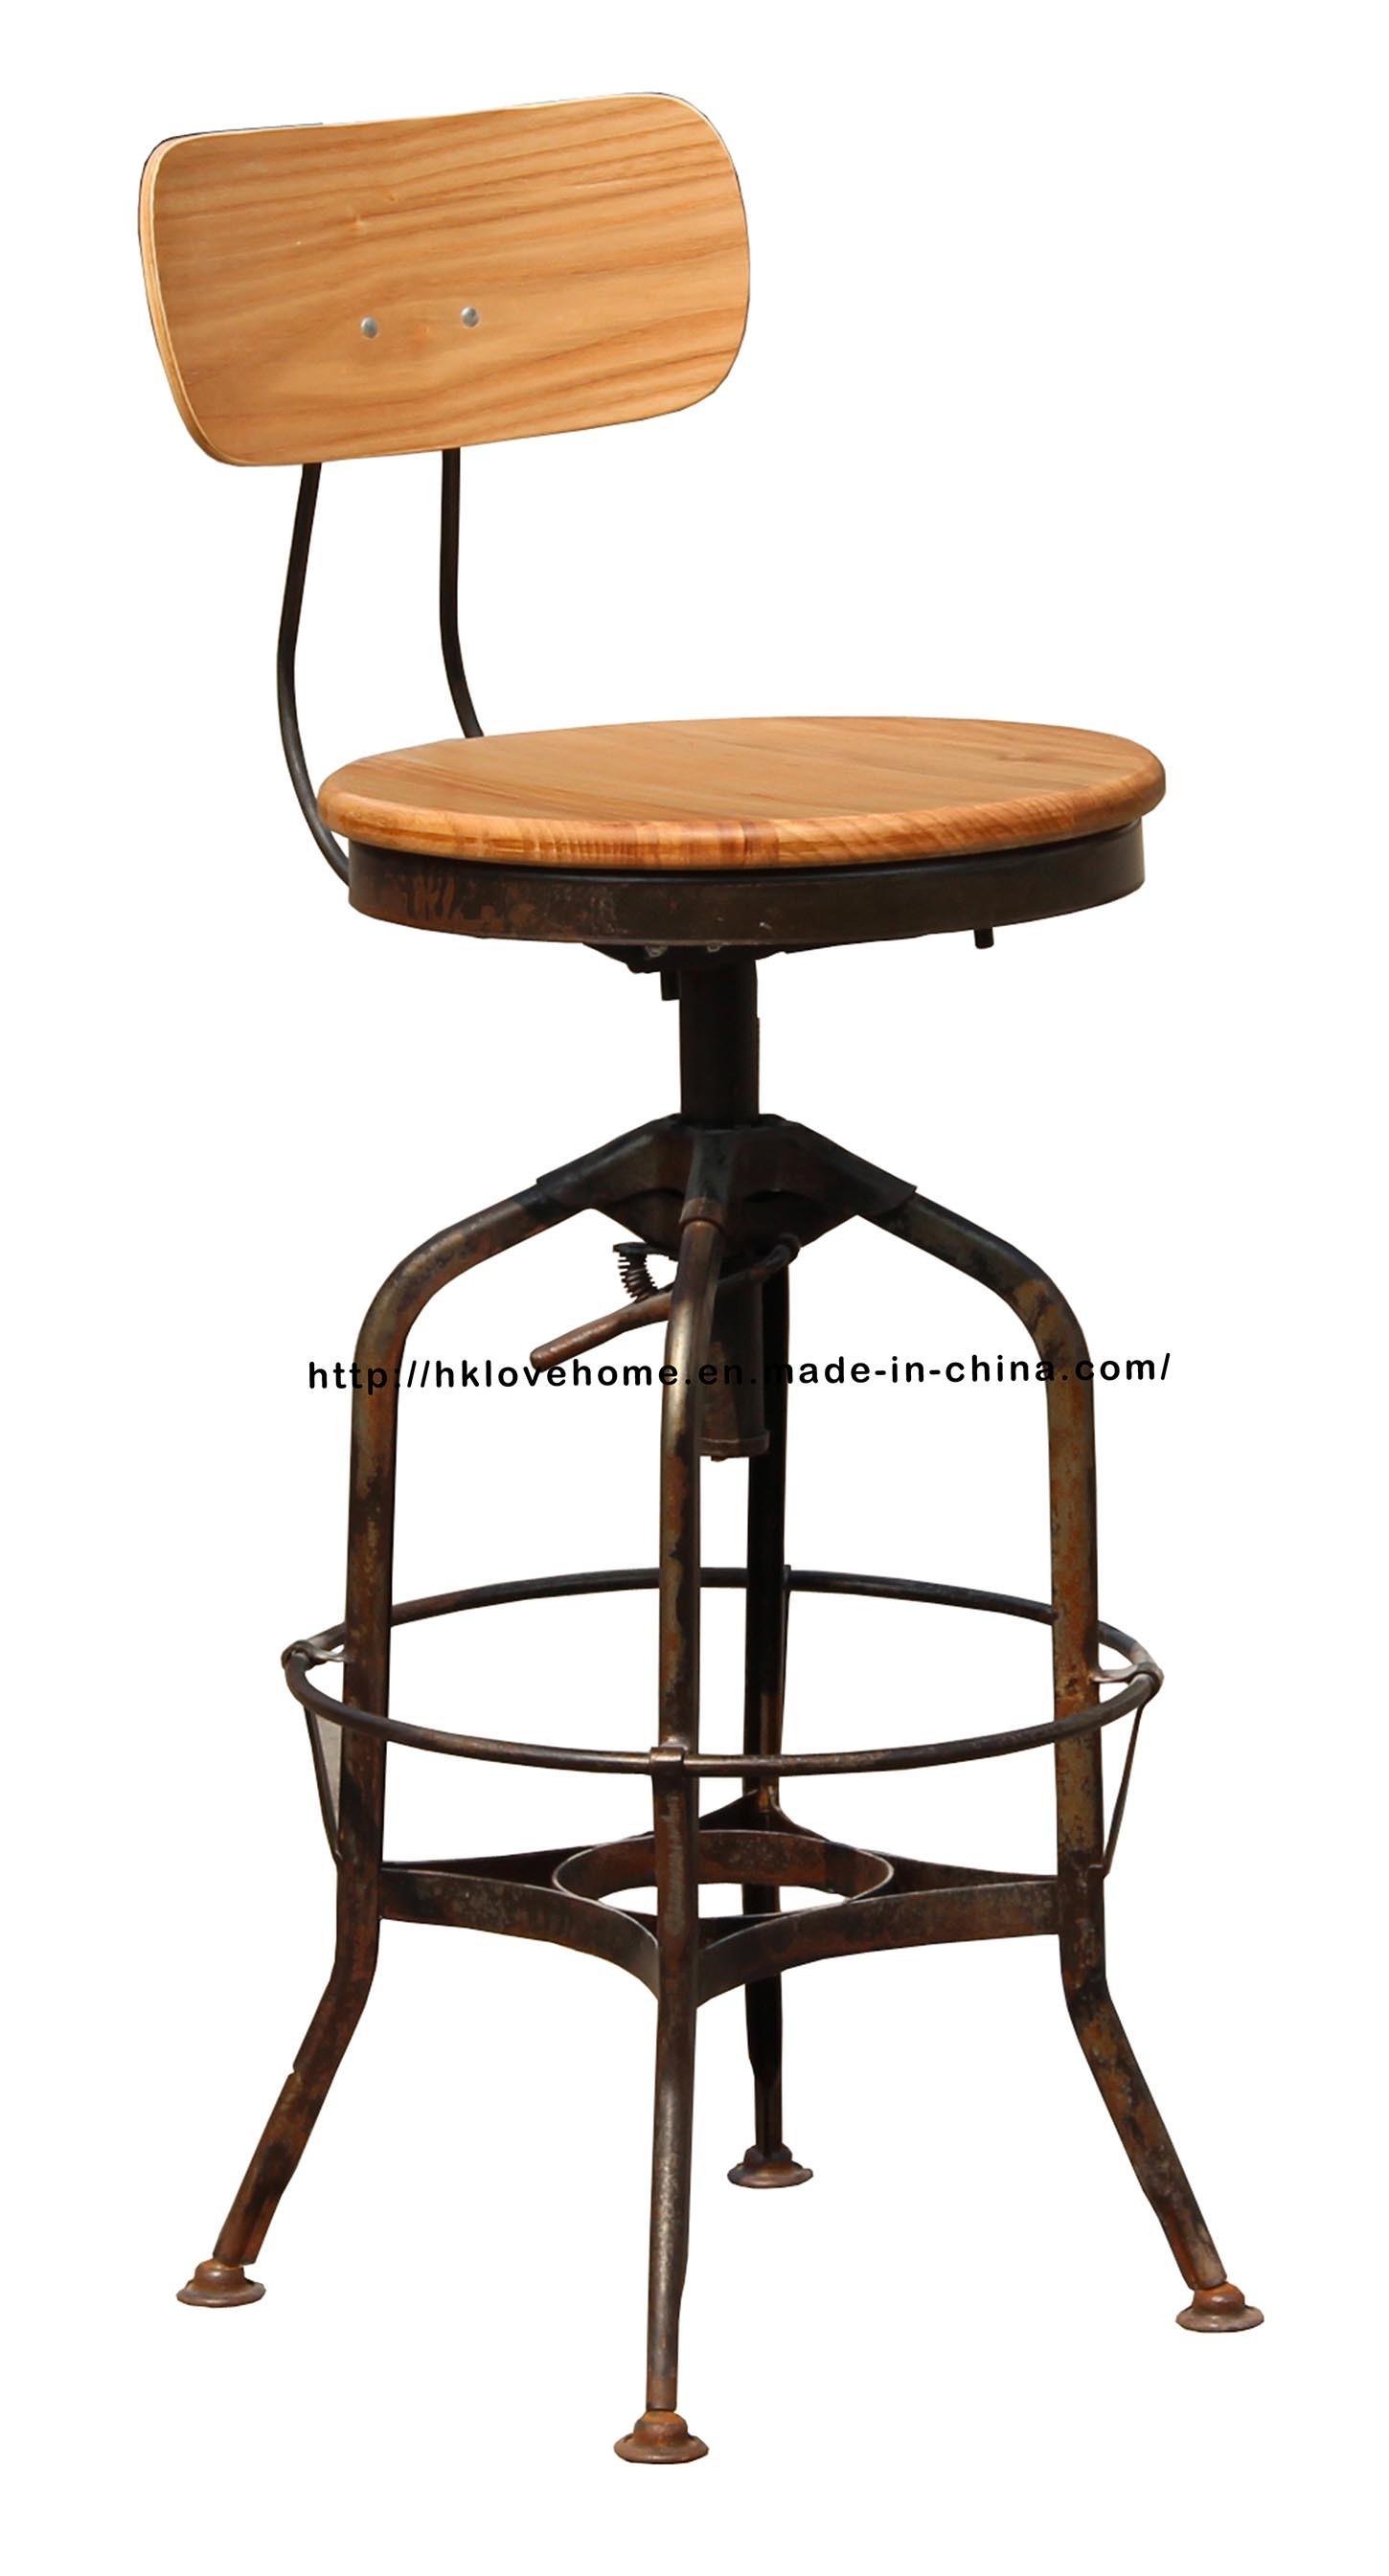 Stupendous Hot Item Industrial Metal Restaurant Furniture Dining Swivel Toledo Bar Stools Chair Short Links Chair Design For Home Short Linksinfo